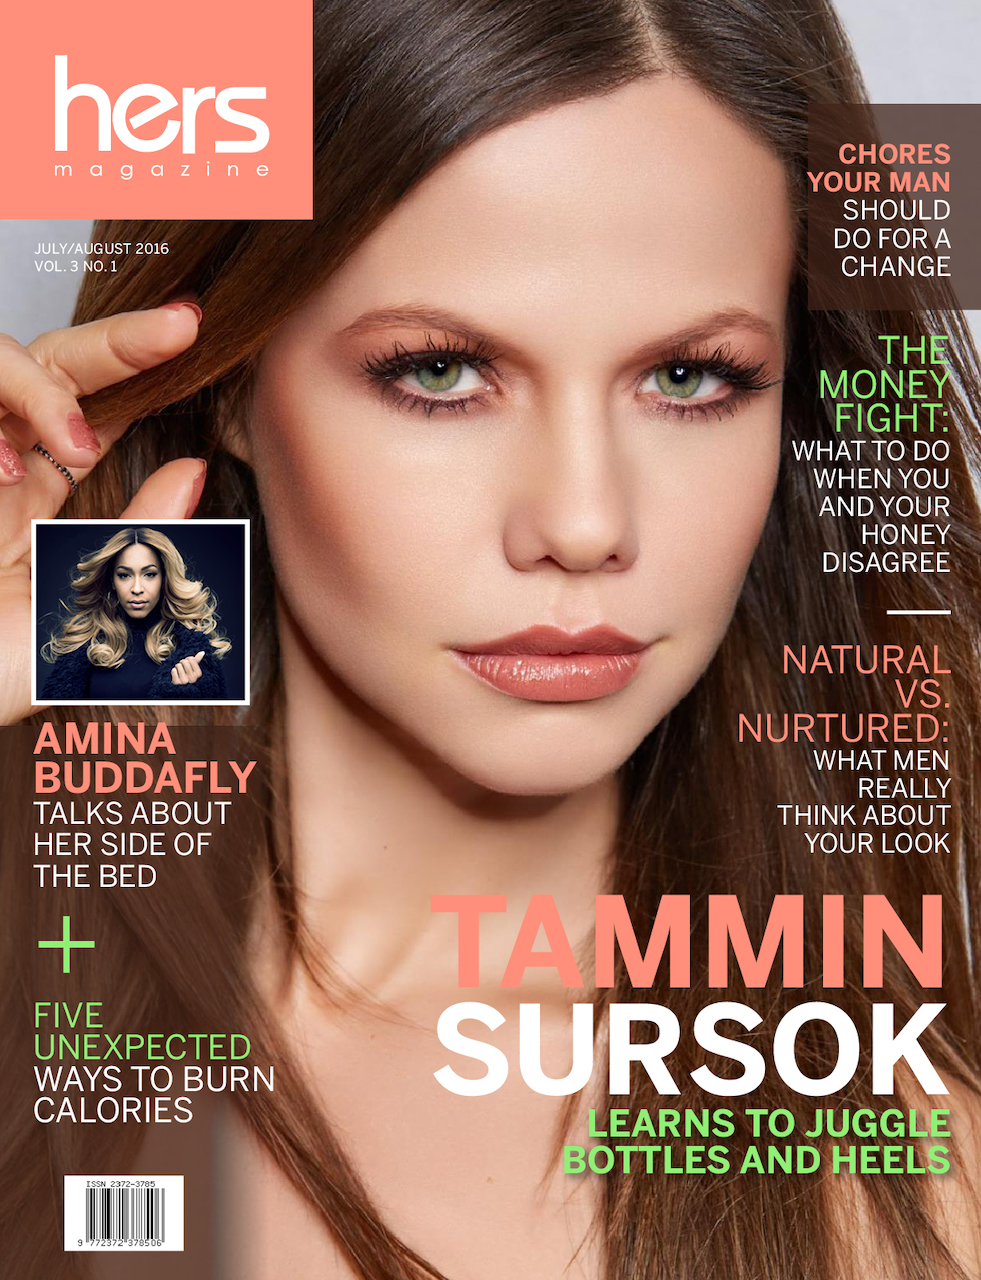 Tammin Sursok